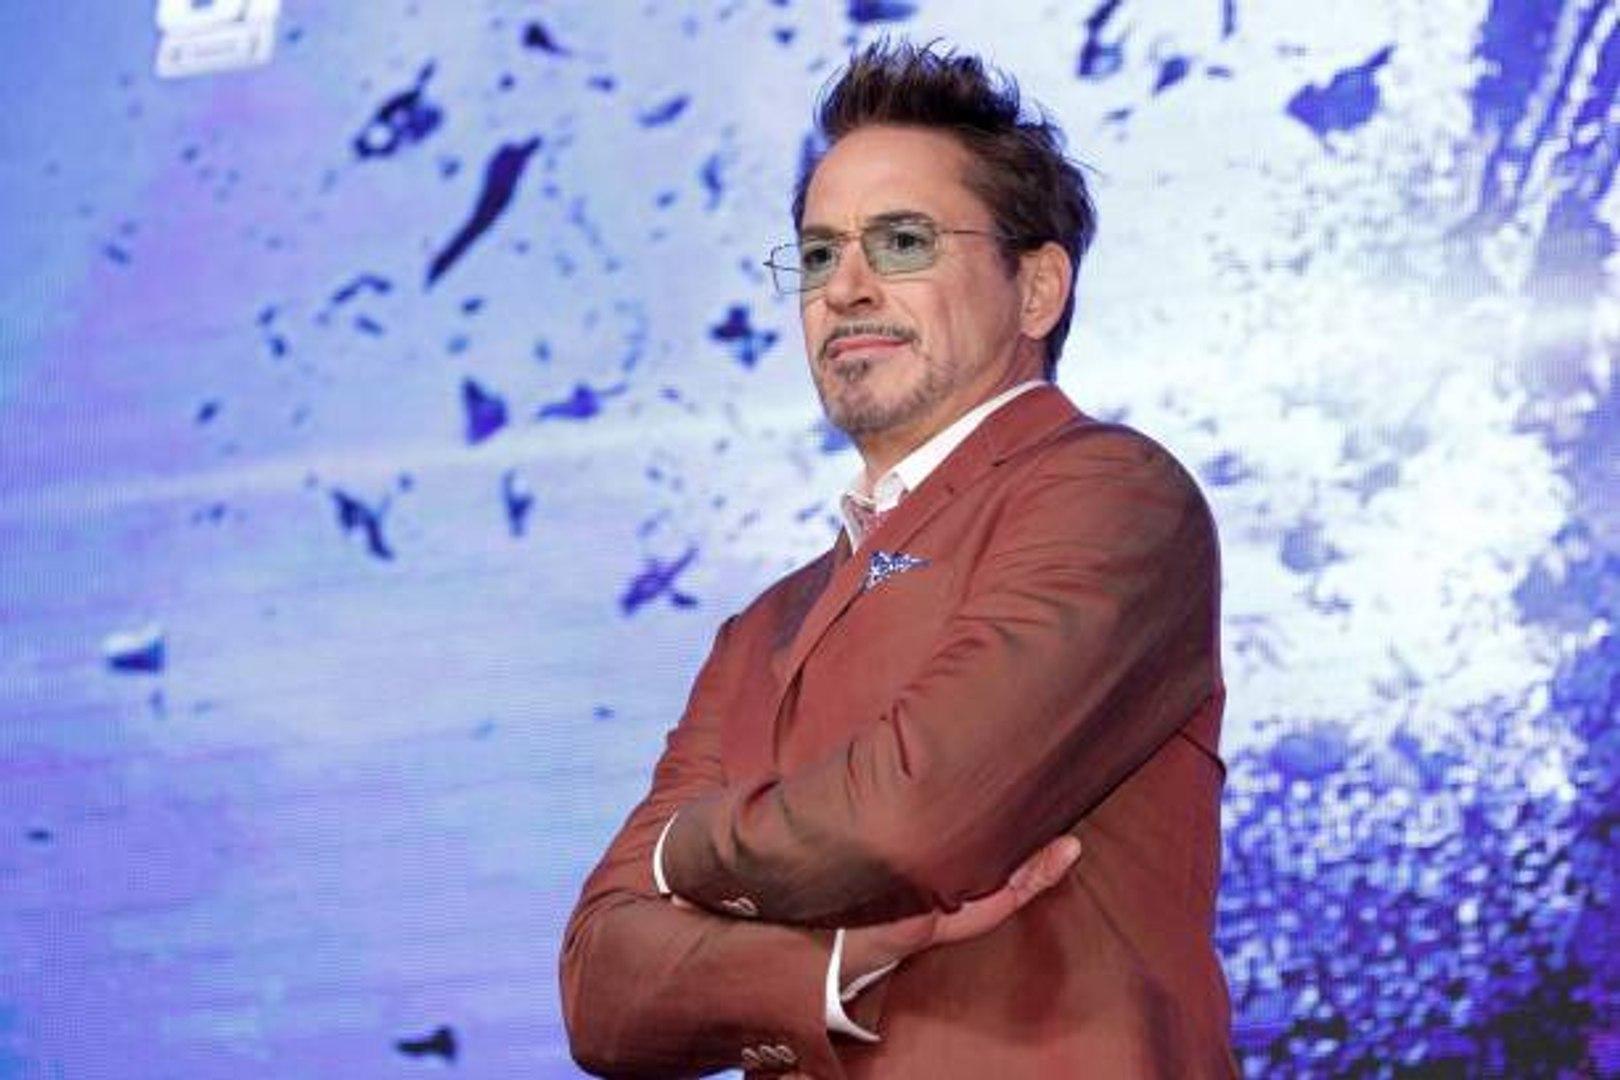 Robert Downey Jr. Looks Back on Playing Iron Man